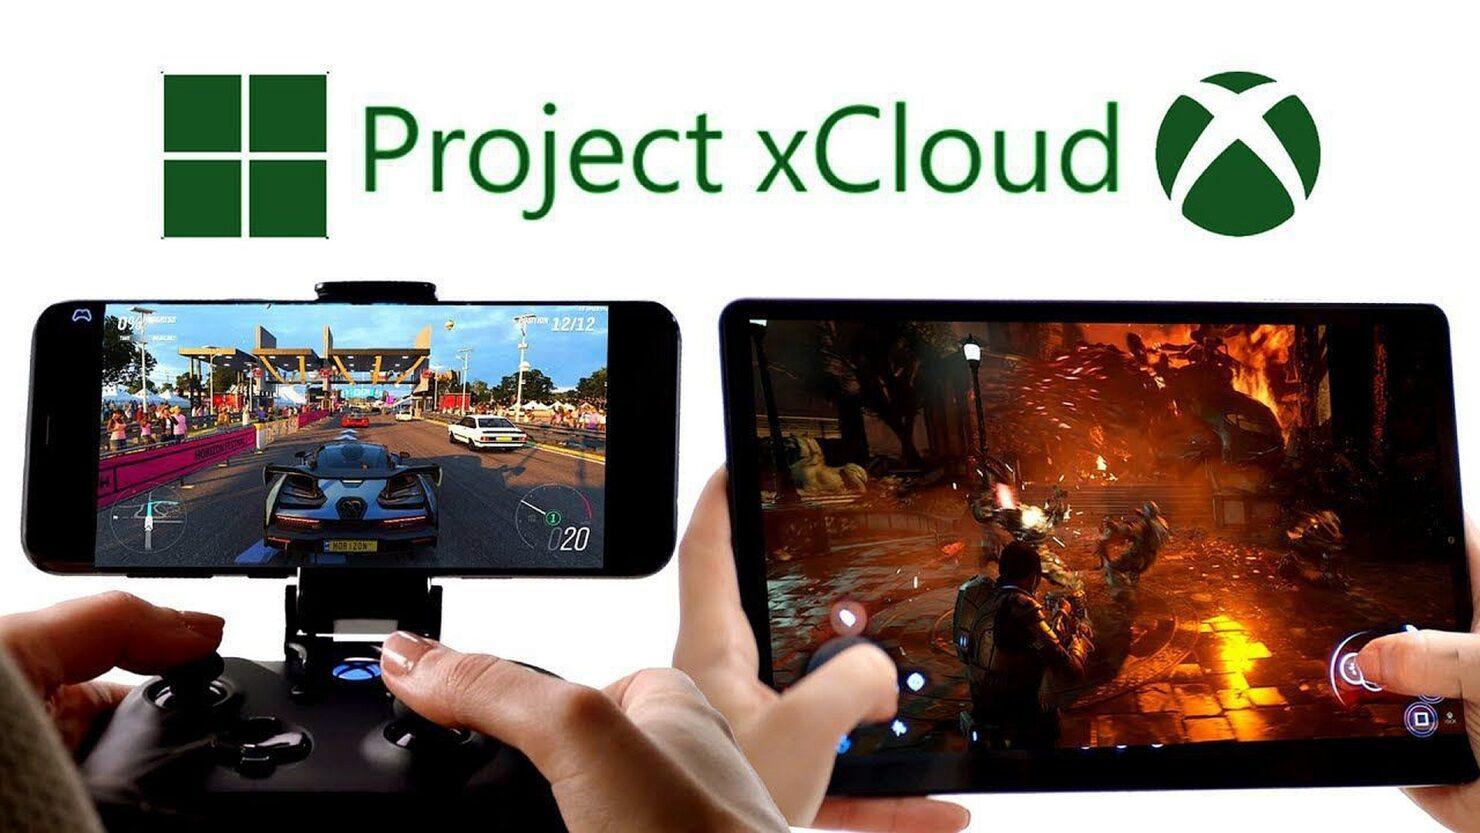 Project xCloud App Store